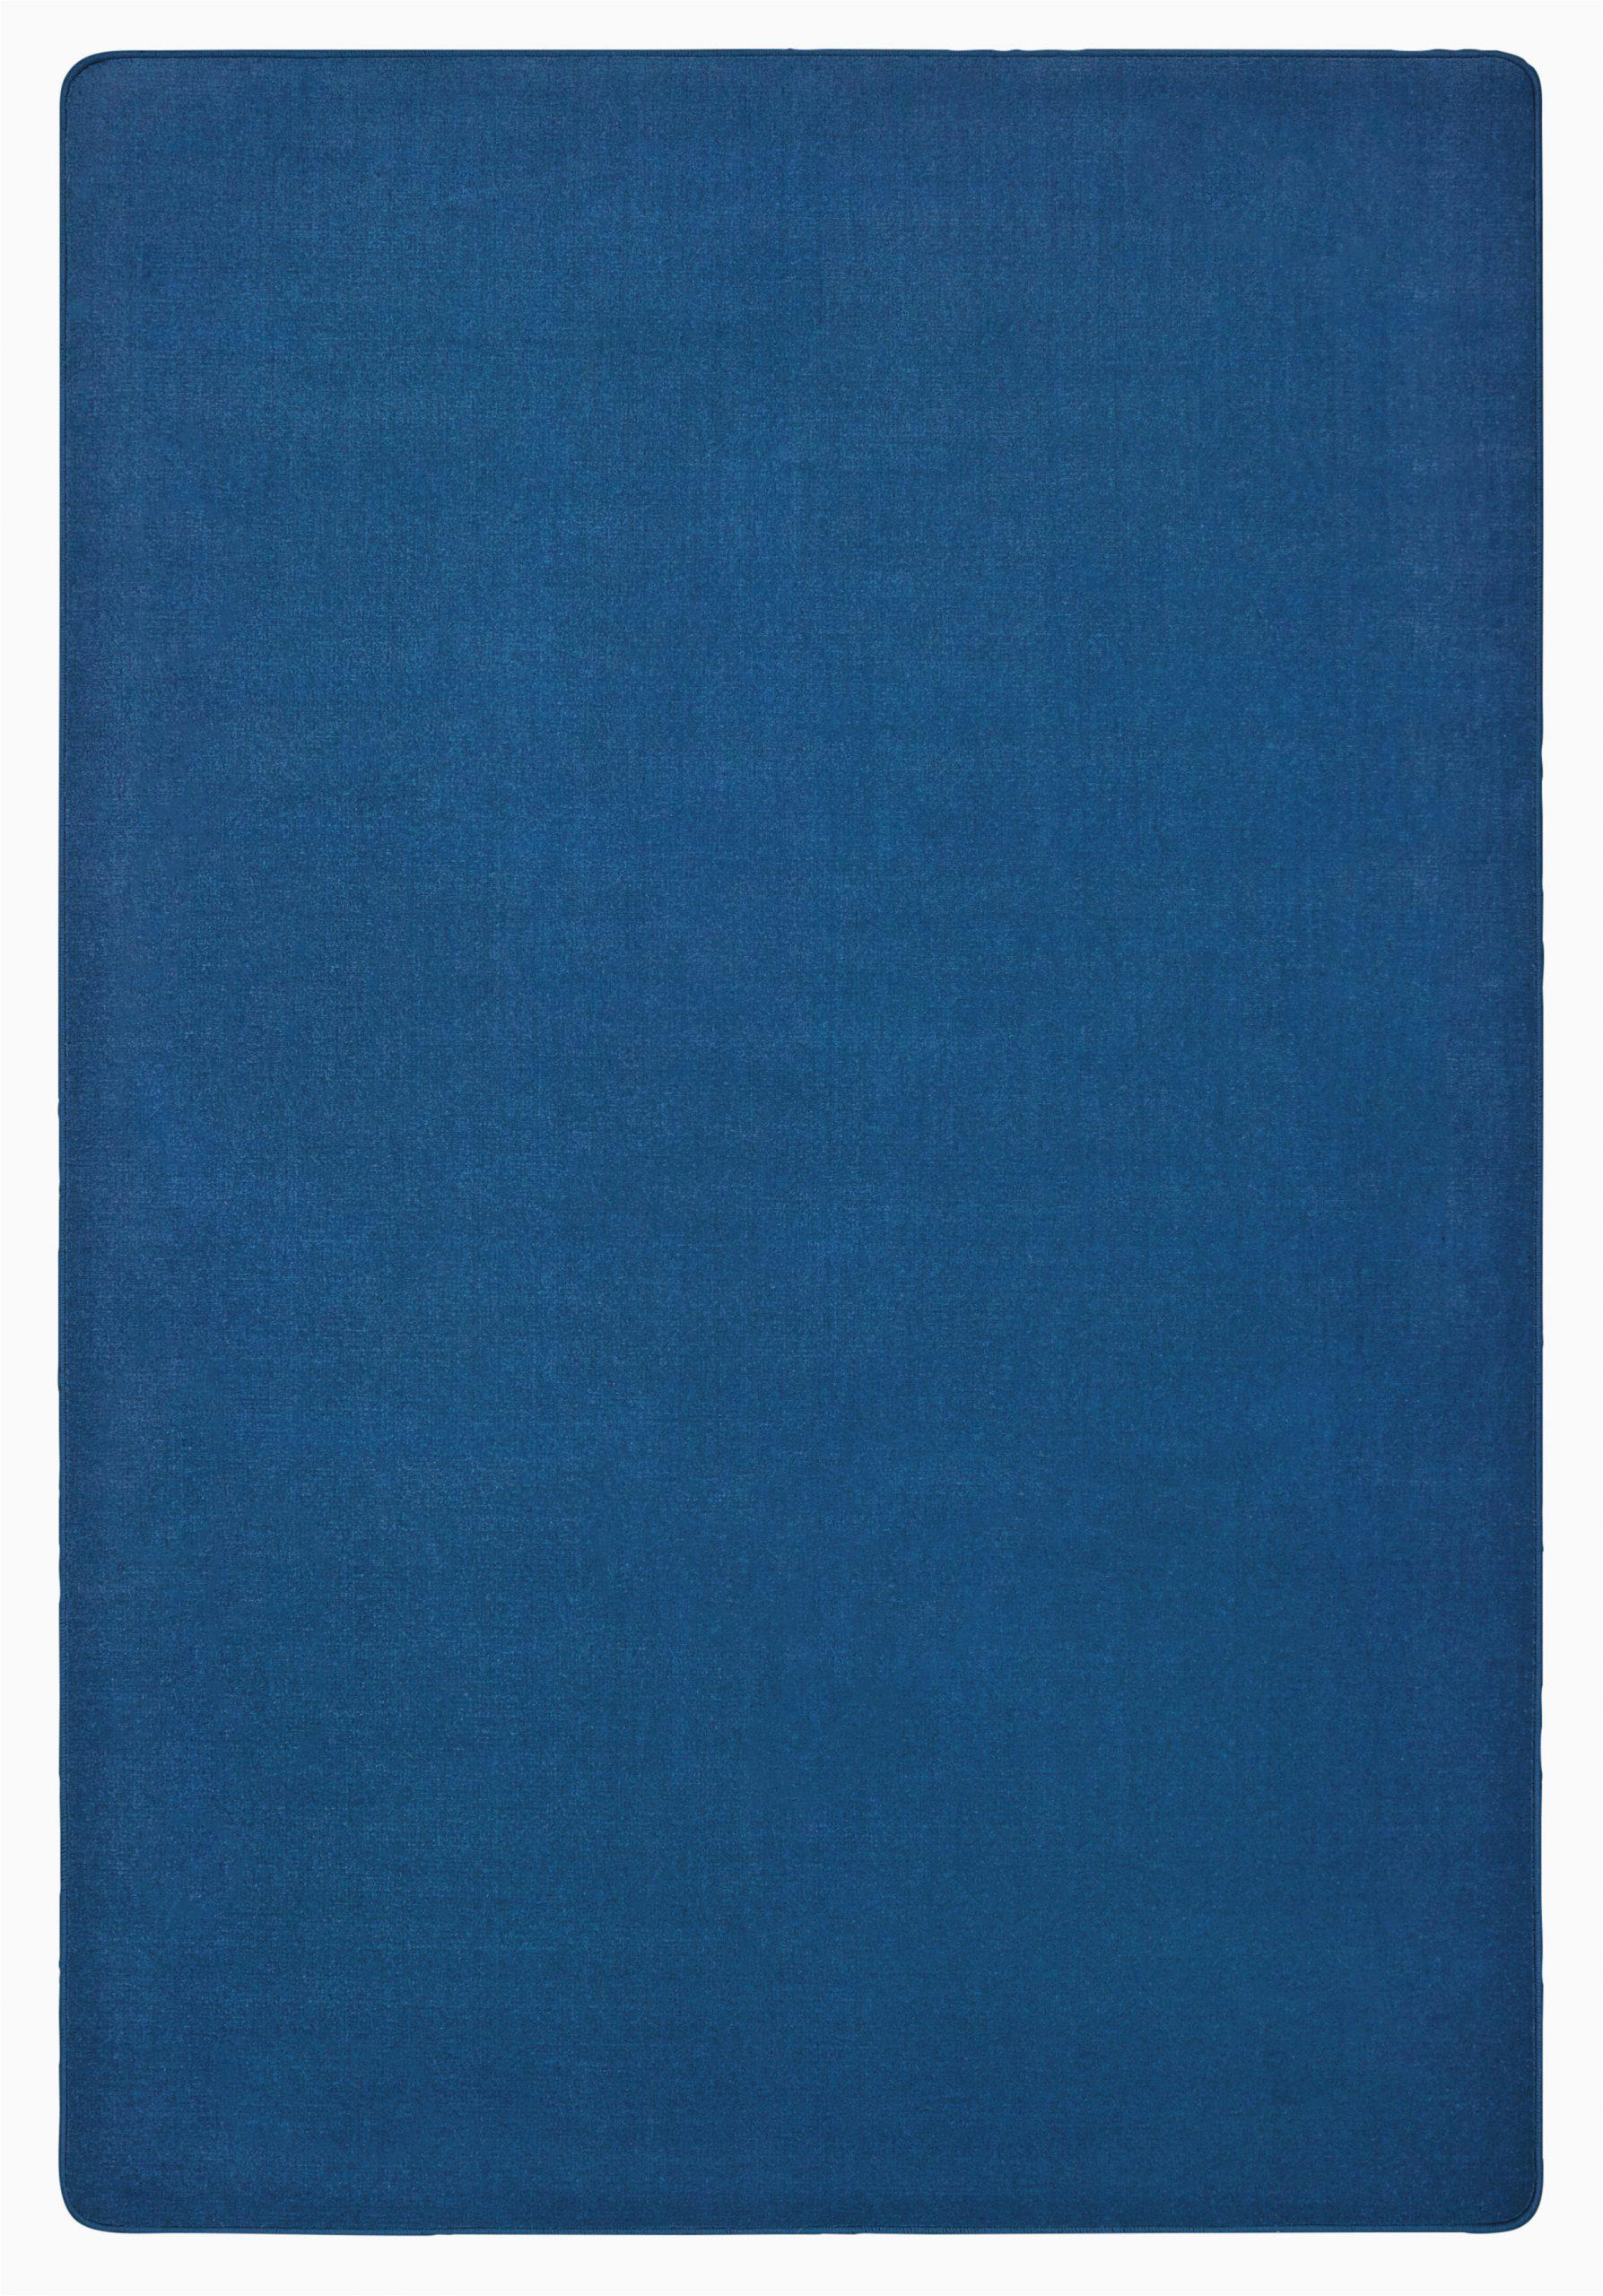 solid tufted blue skies area rug